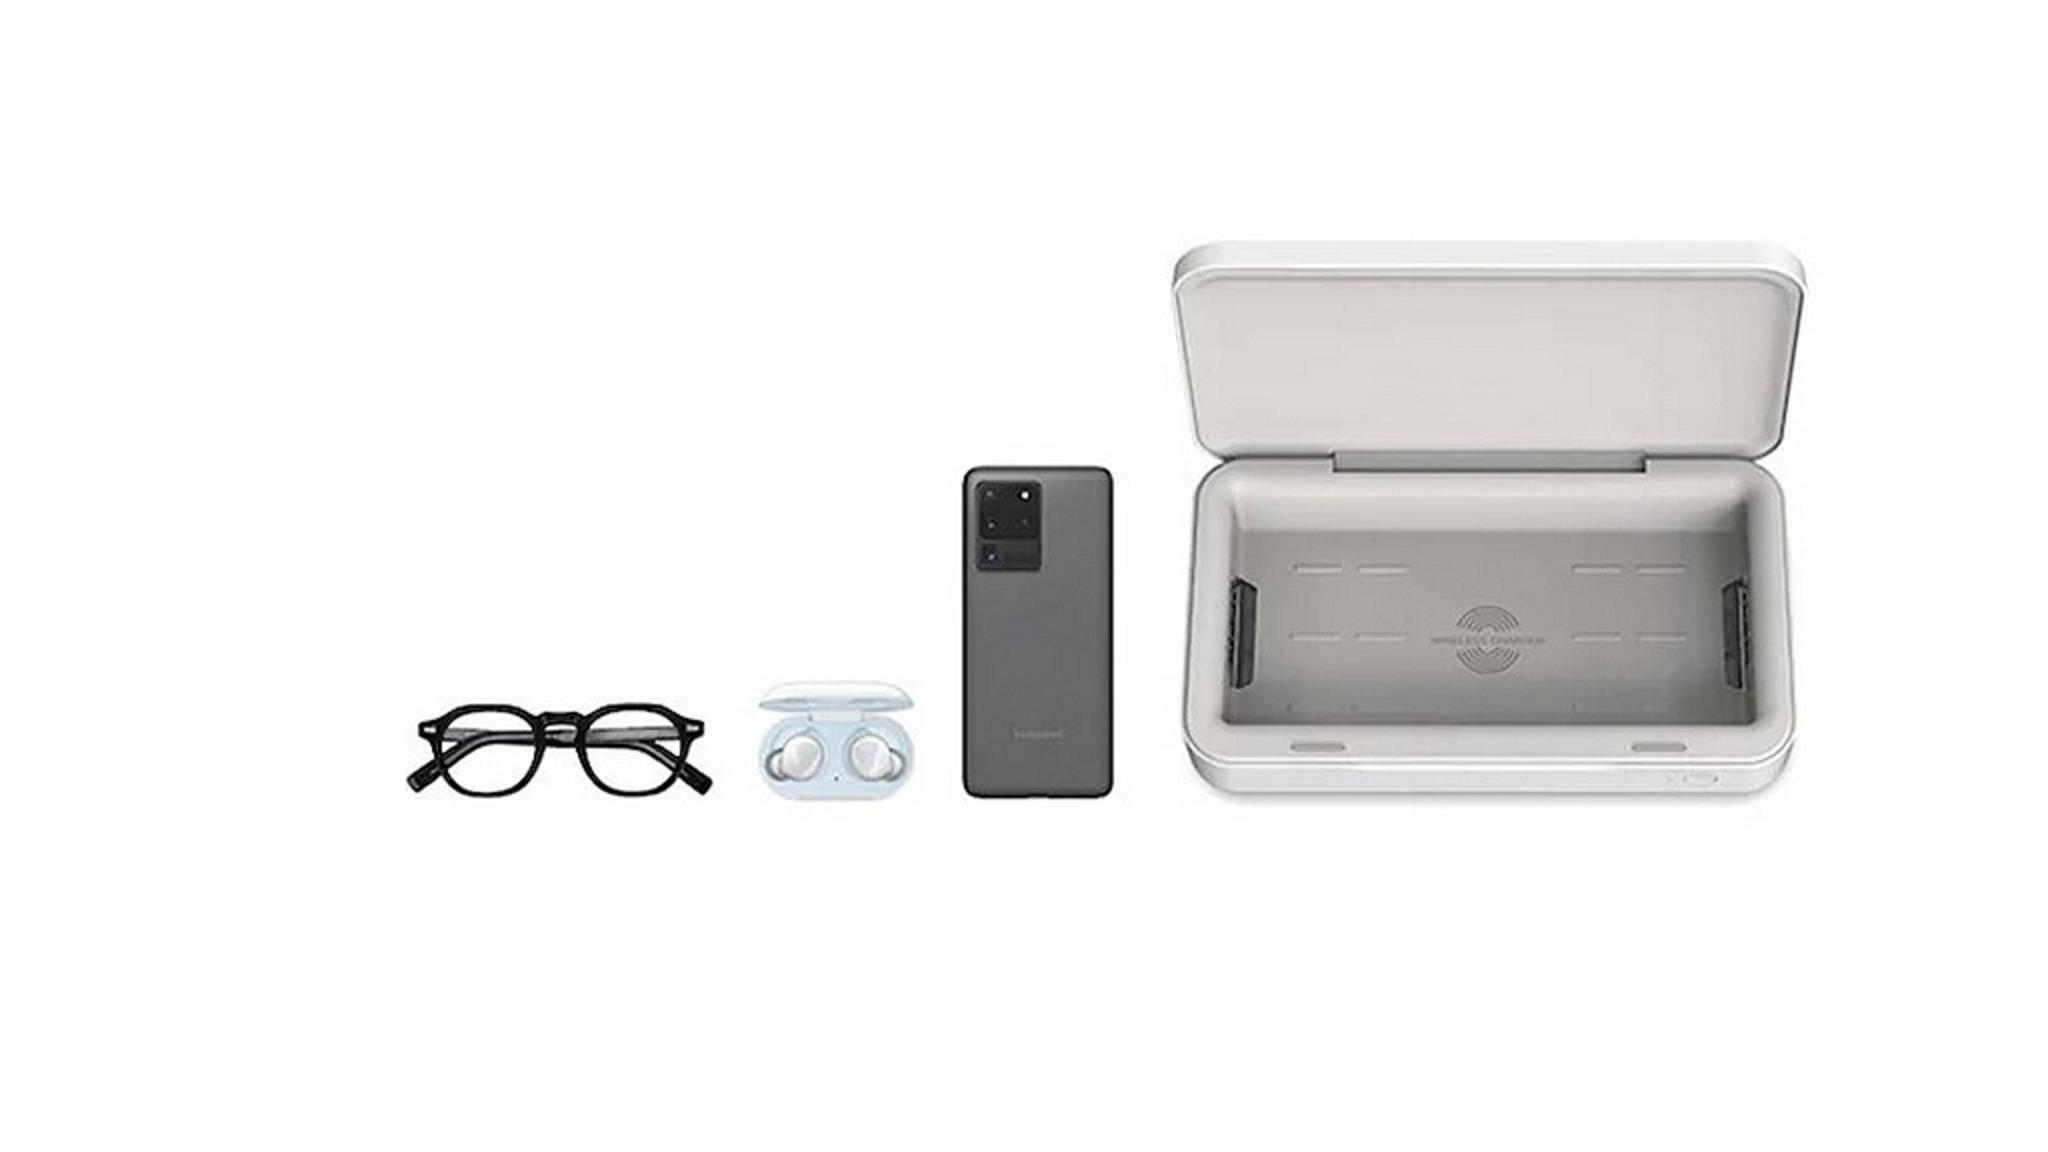 Samsung-Wireless-Charger-Sterilizer